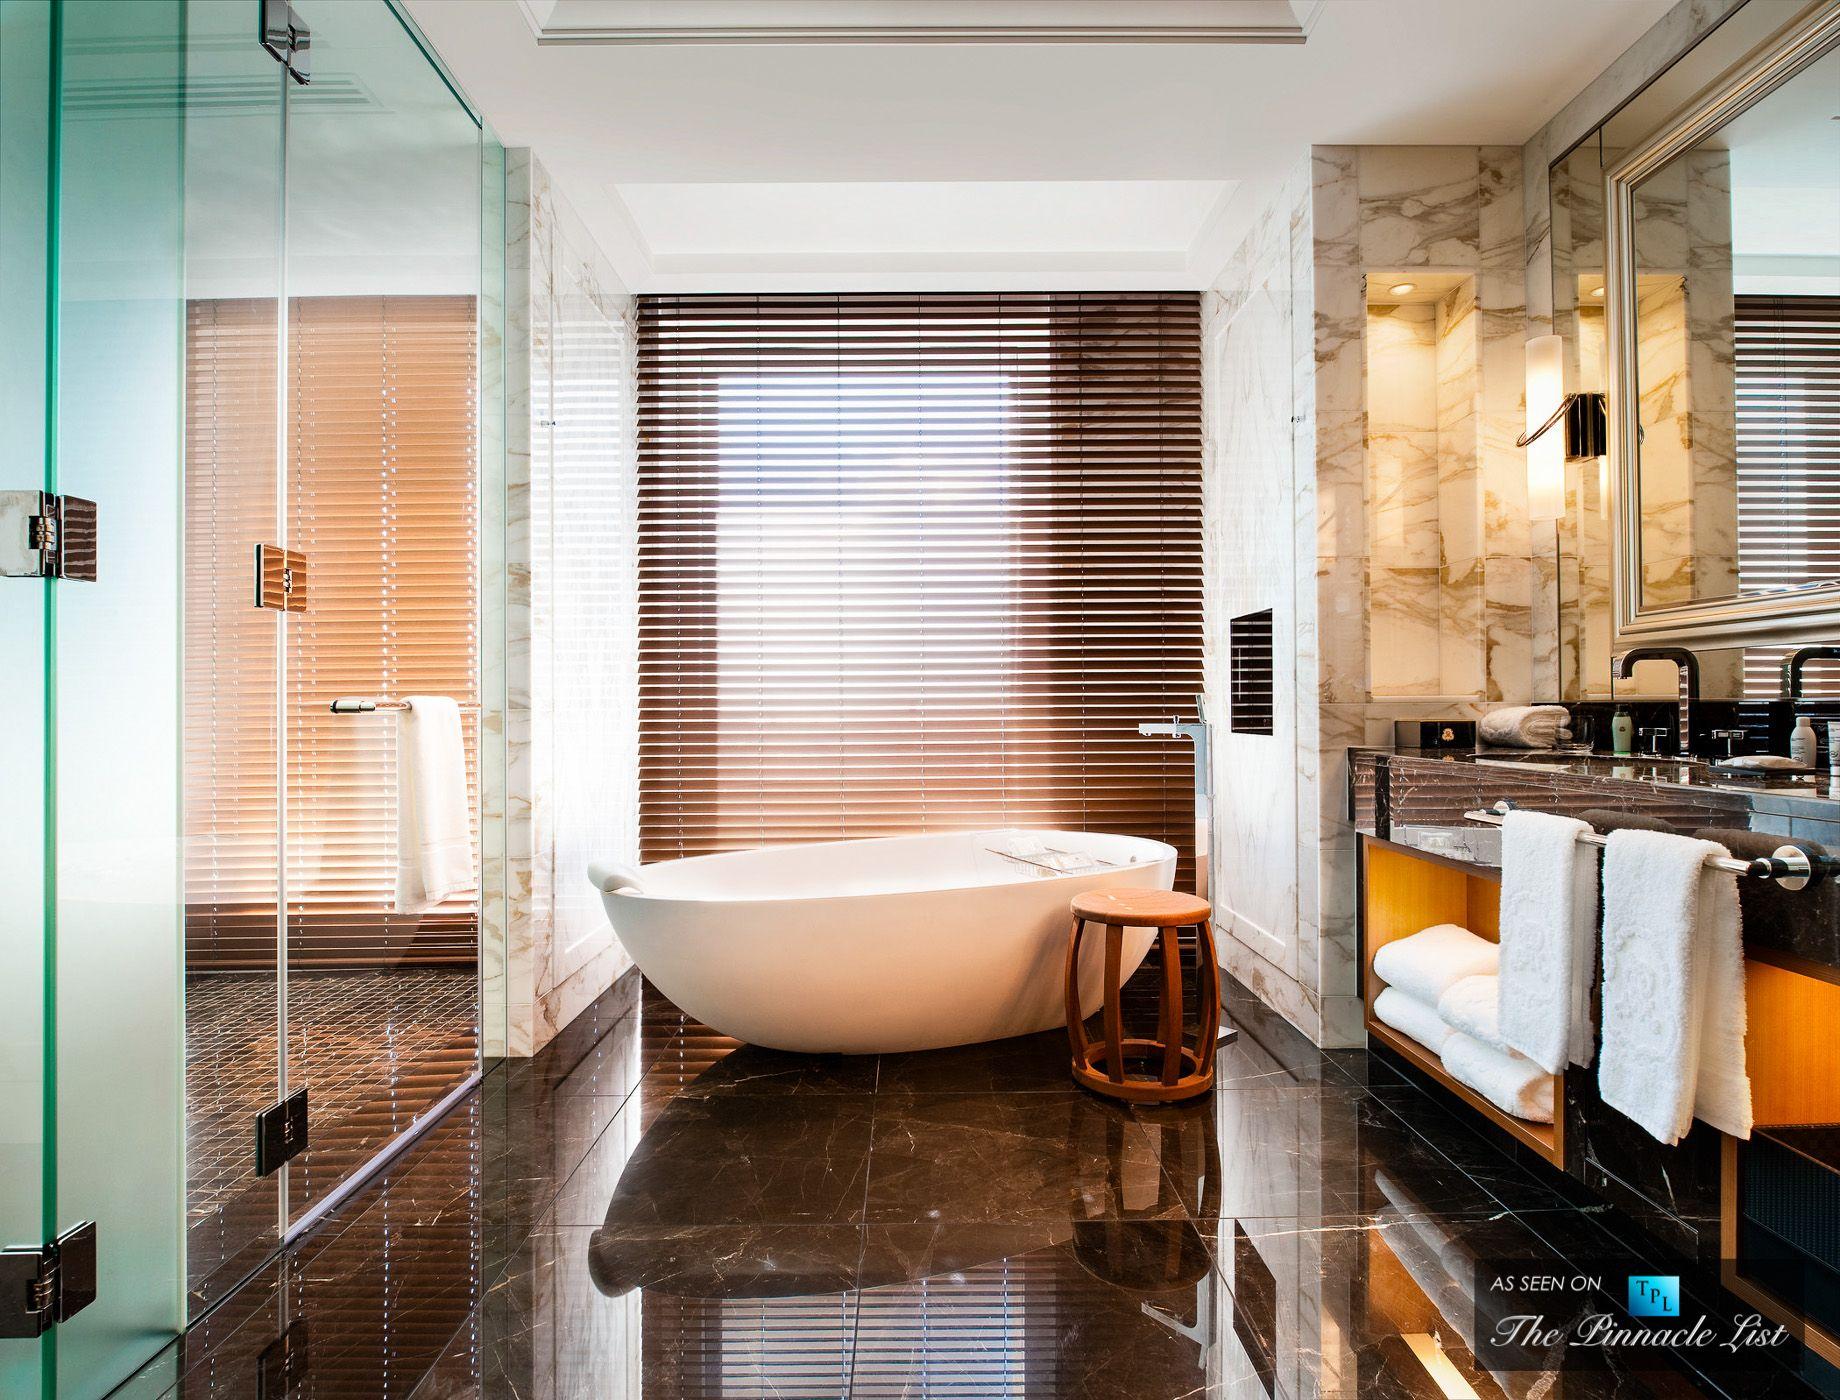 Luxury Hotel Bathroom Design Ideas Part - 17: Luxury Hotel Bathroom Design Ideas 5 On Living Room Simple Home Design